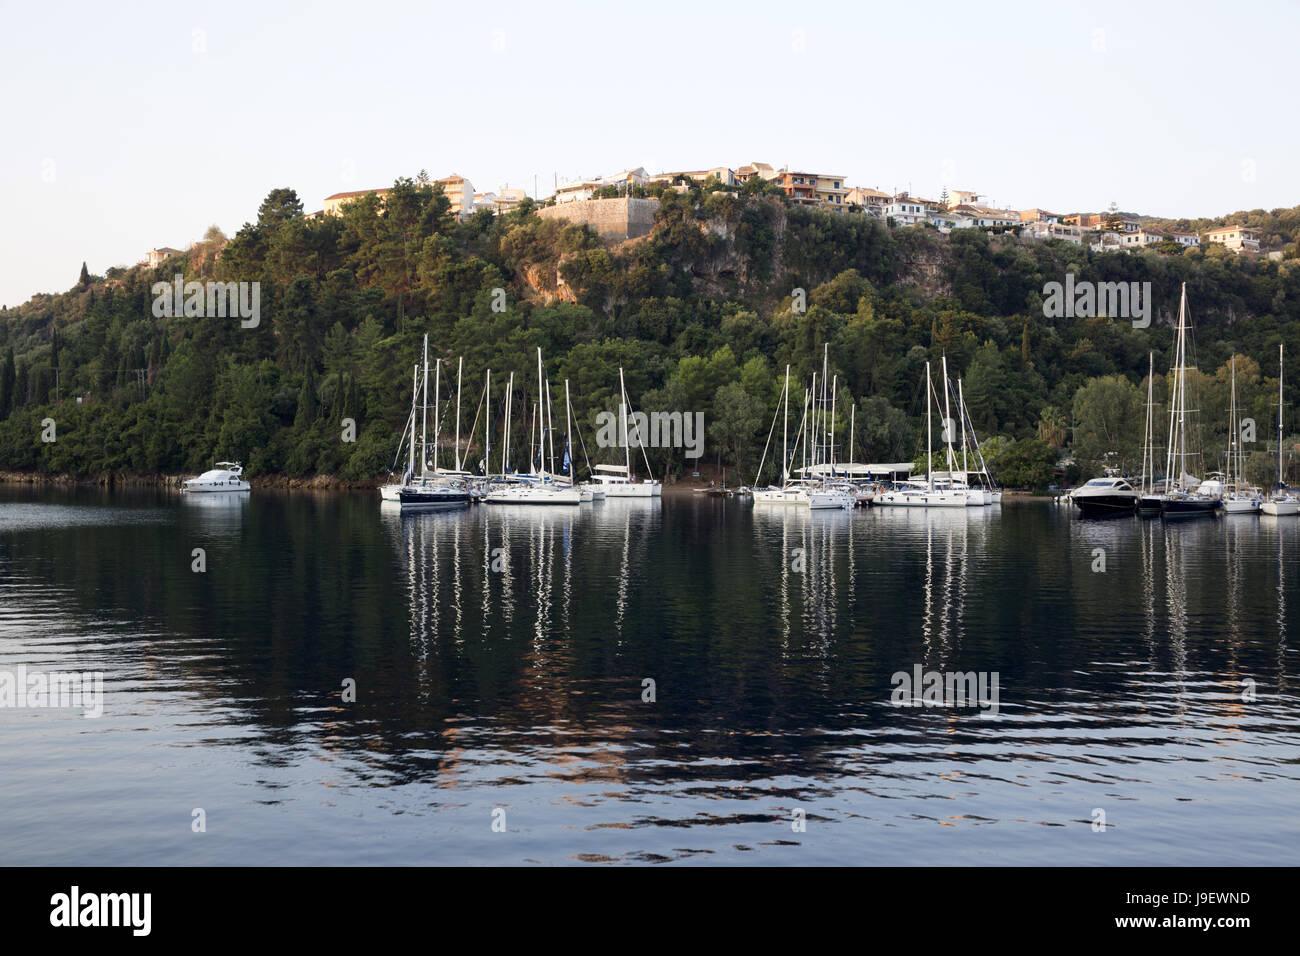 Spilia and Spartochori, Meganisi, Greece - Stock Image